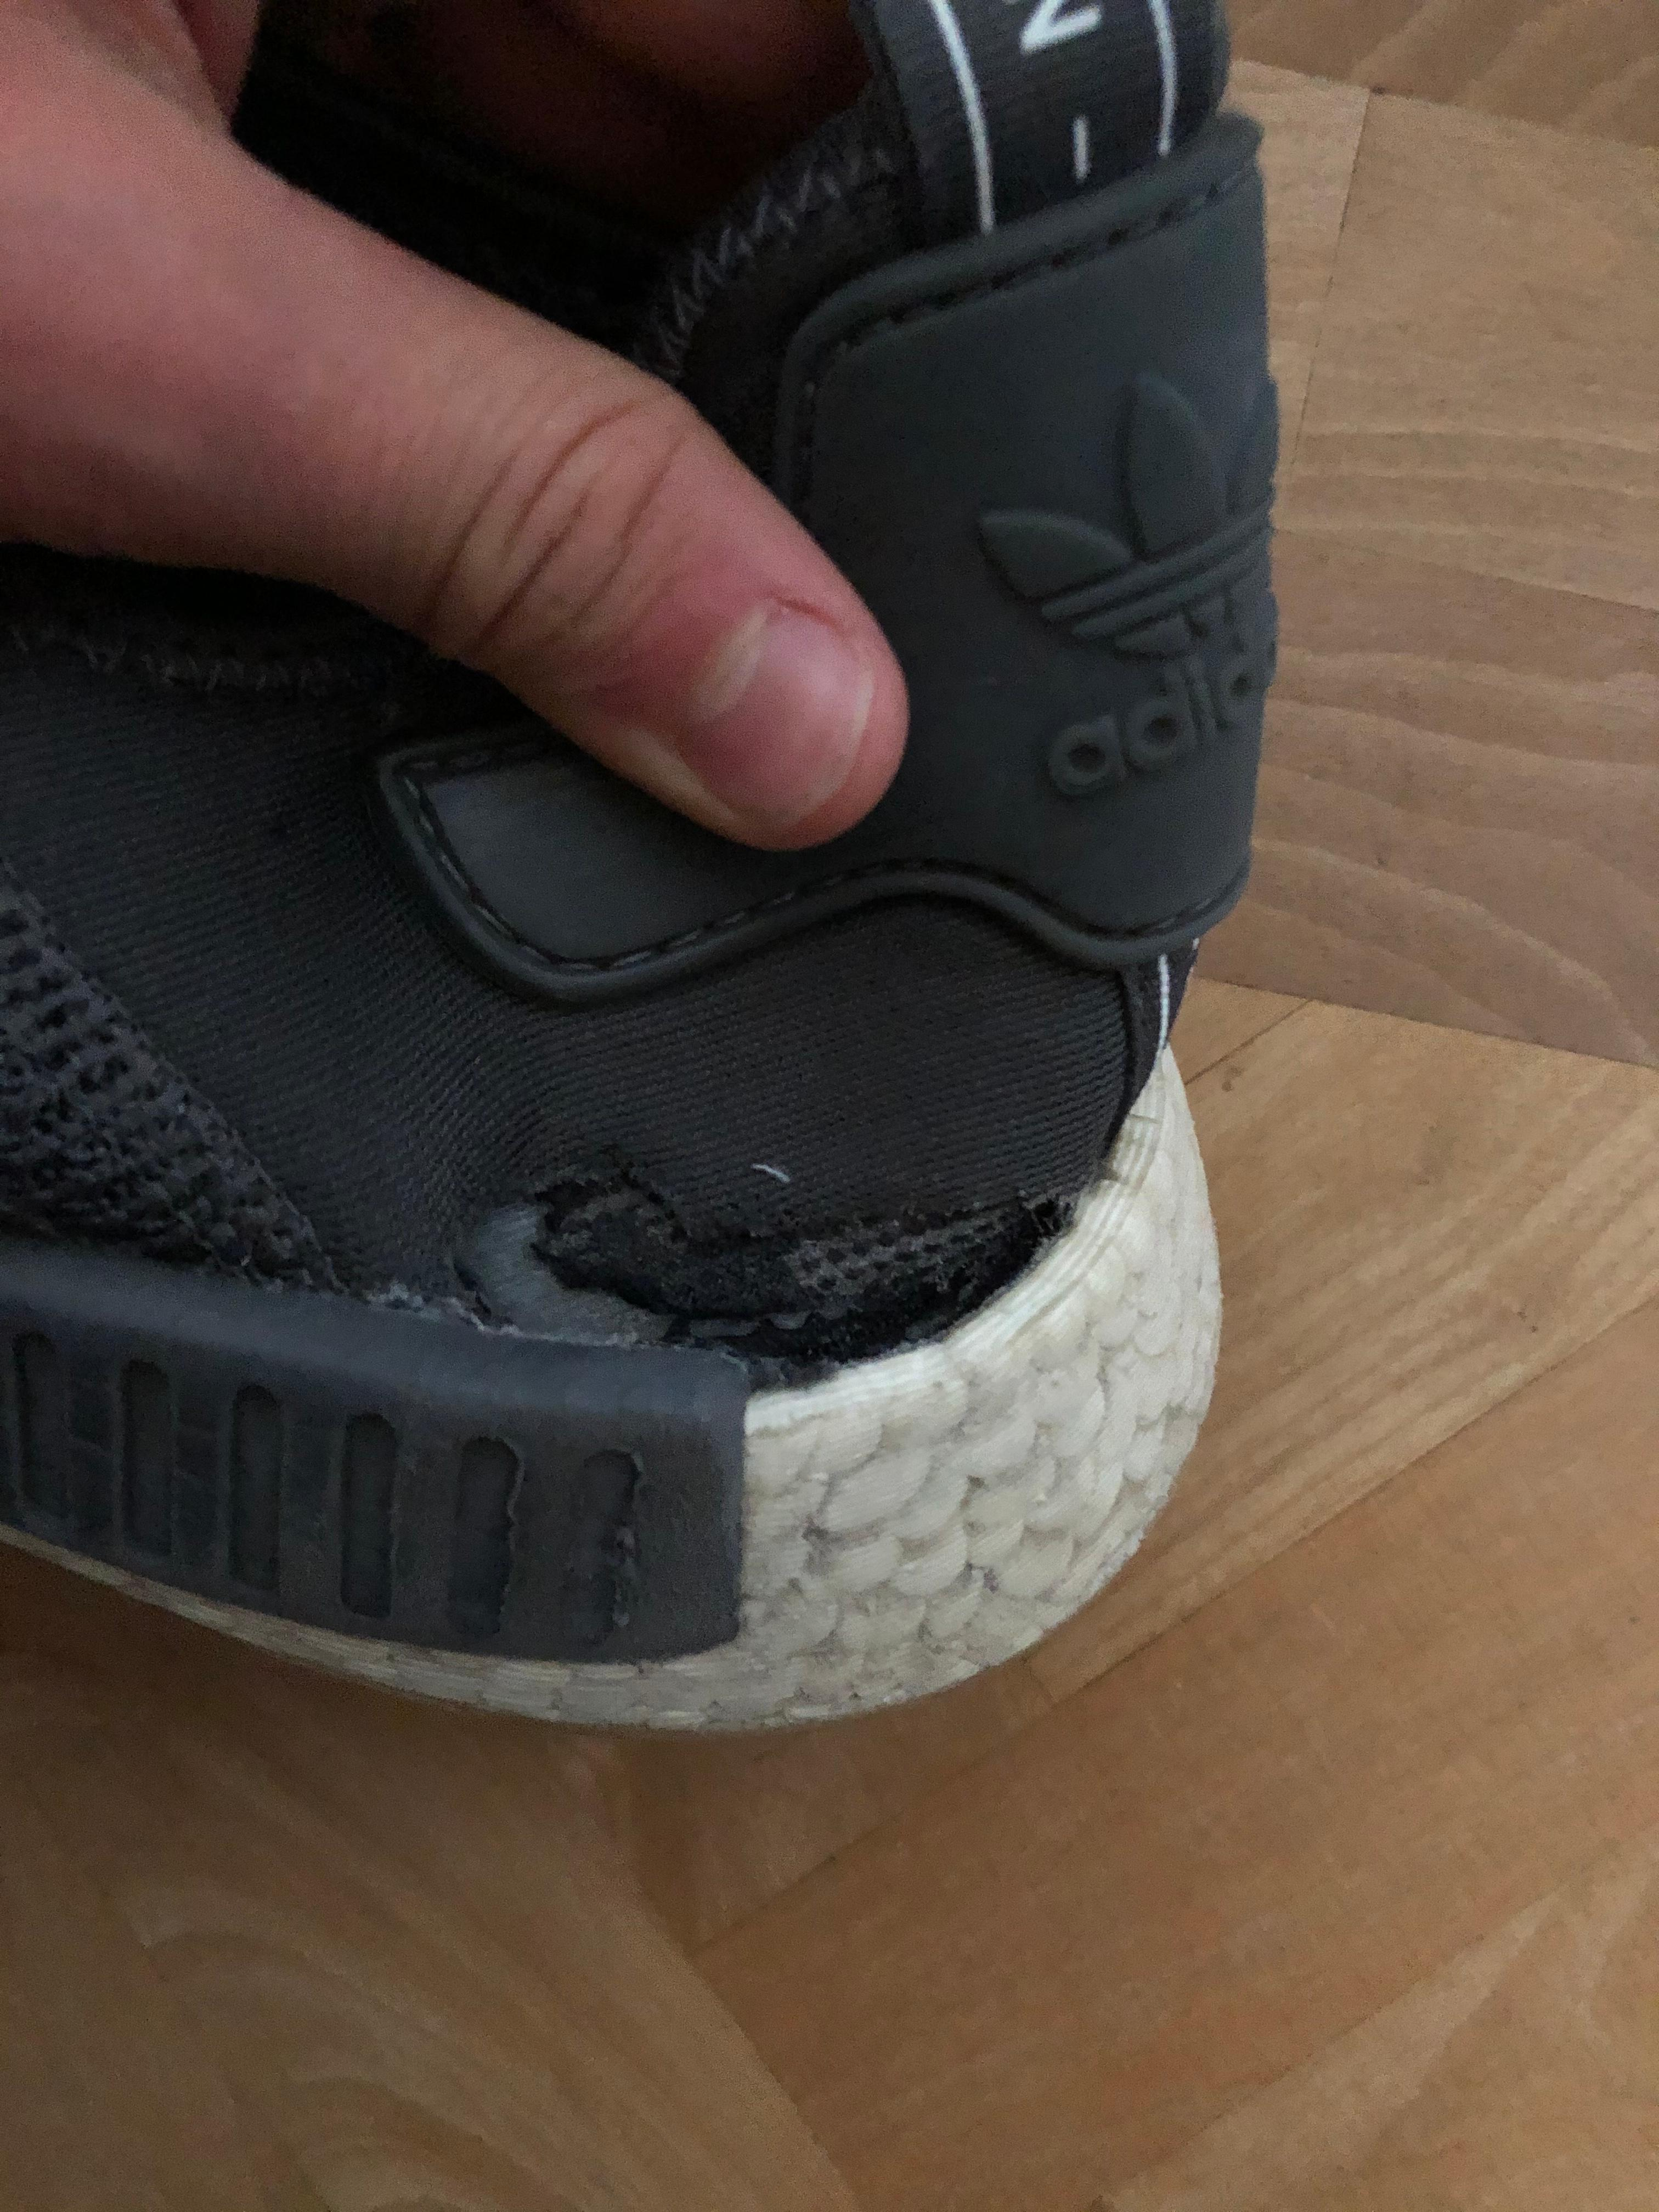 Produktionsfehler bei Adidas NMDs? (Schuhe, Sneaker